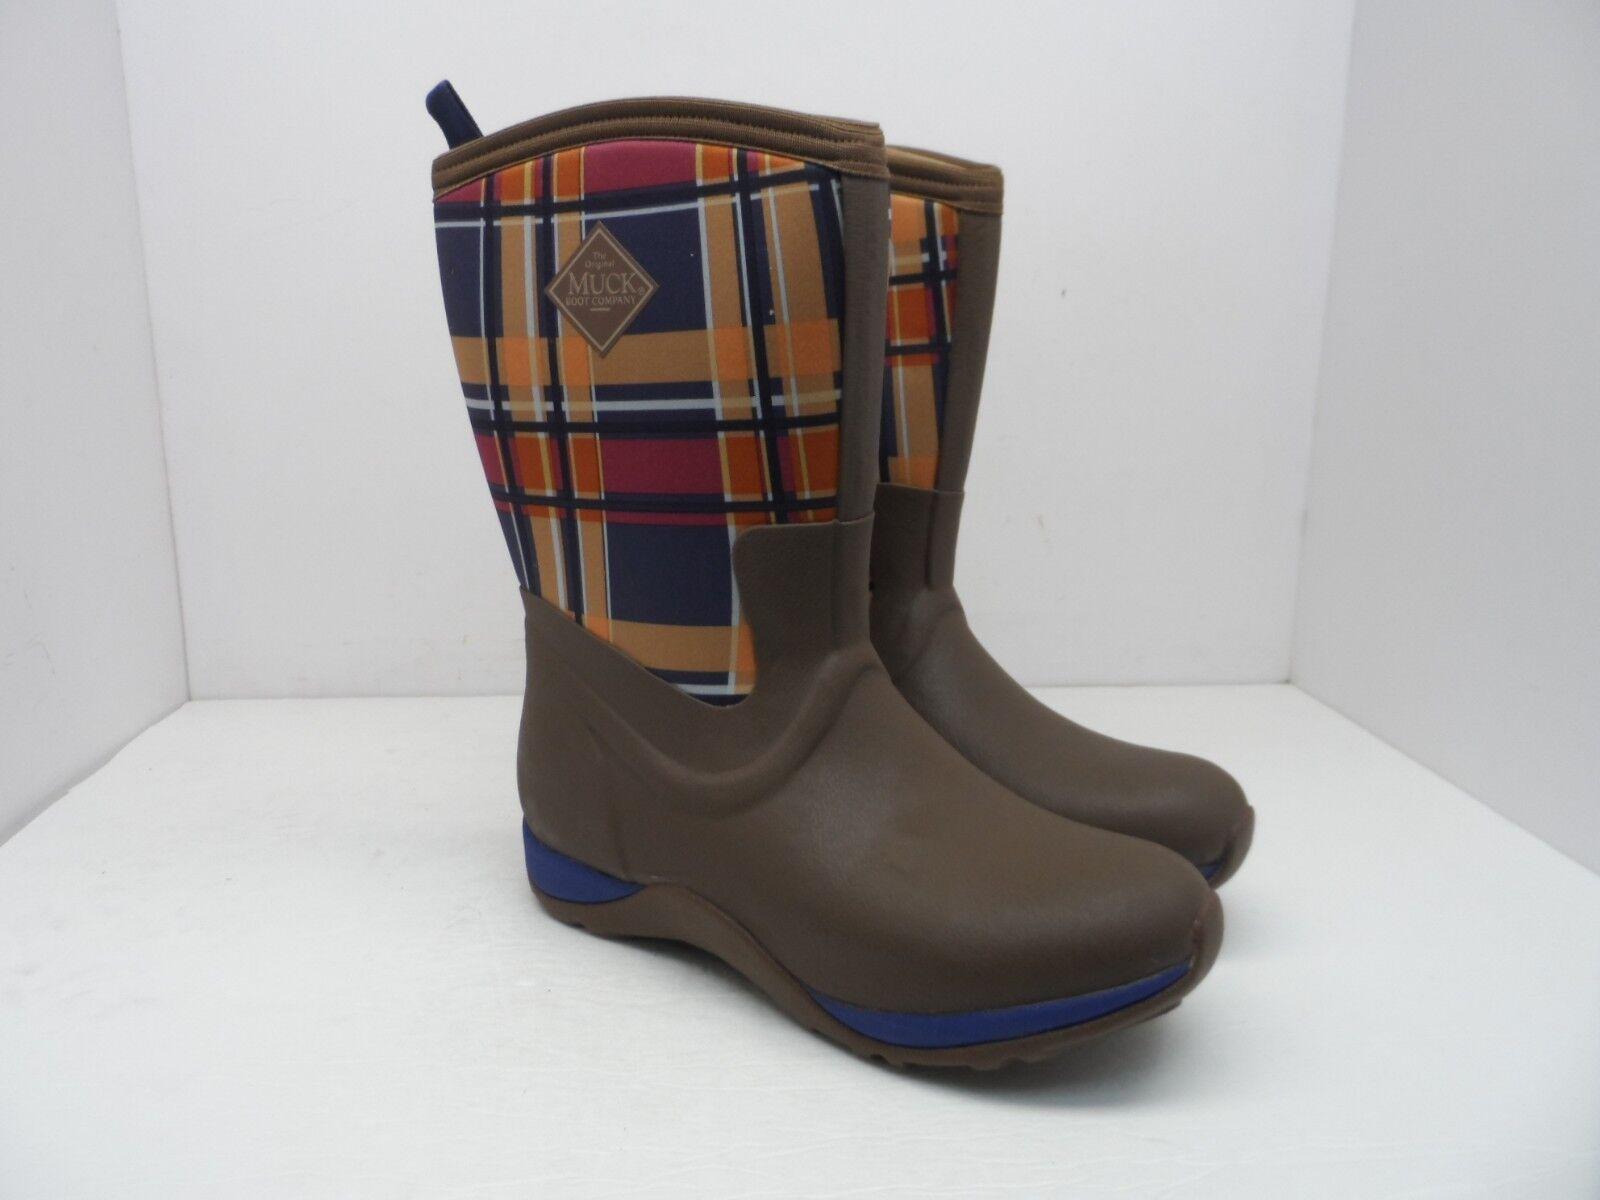 Muck botas para Mujer Ártico fin de semana botas De Invierno WAW-92PLD Marrón Azul Marino a Cuadros 5M